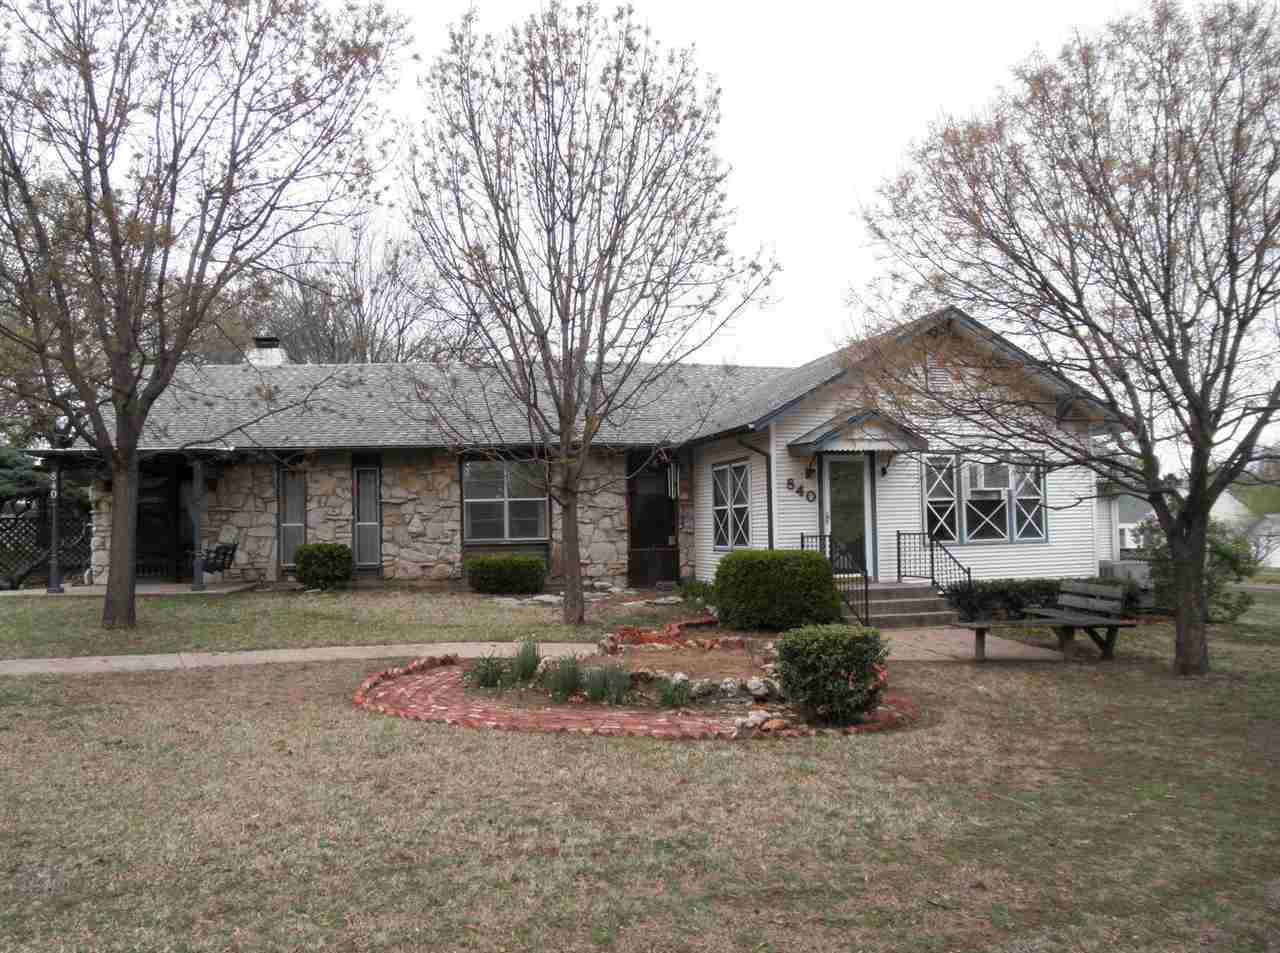 Sold Intraoffice W/MLS | 840 N Birch Ponca City, OK 74601-3003 0